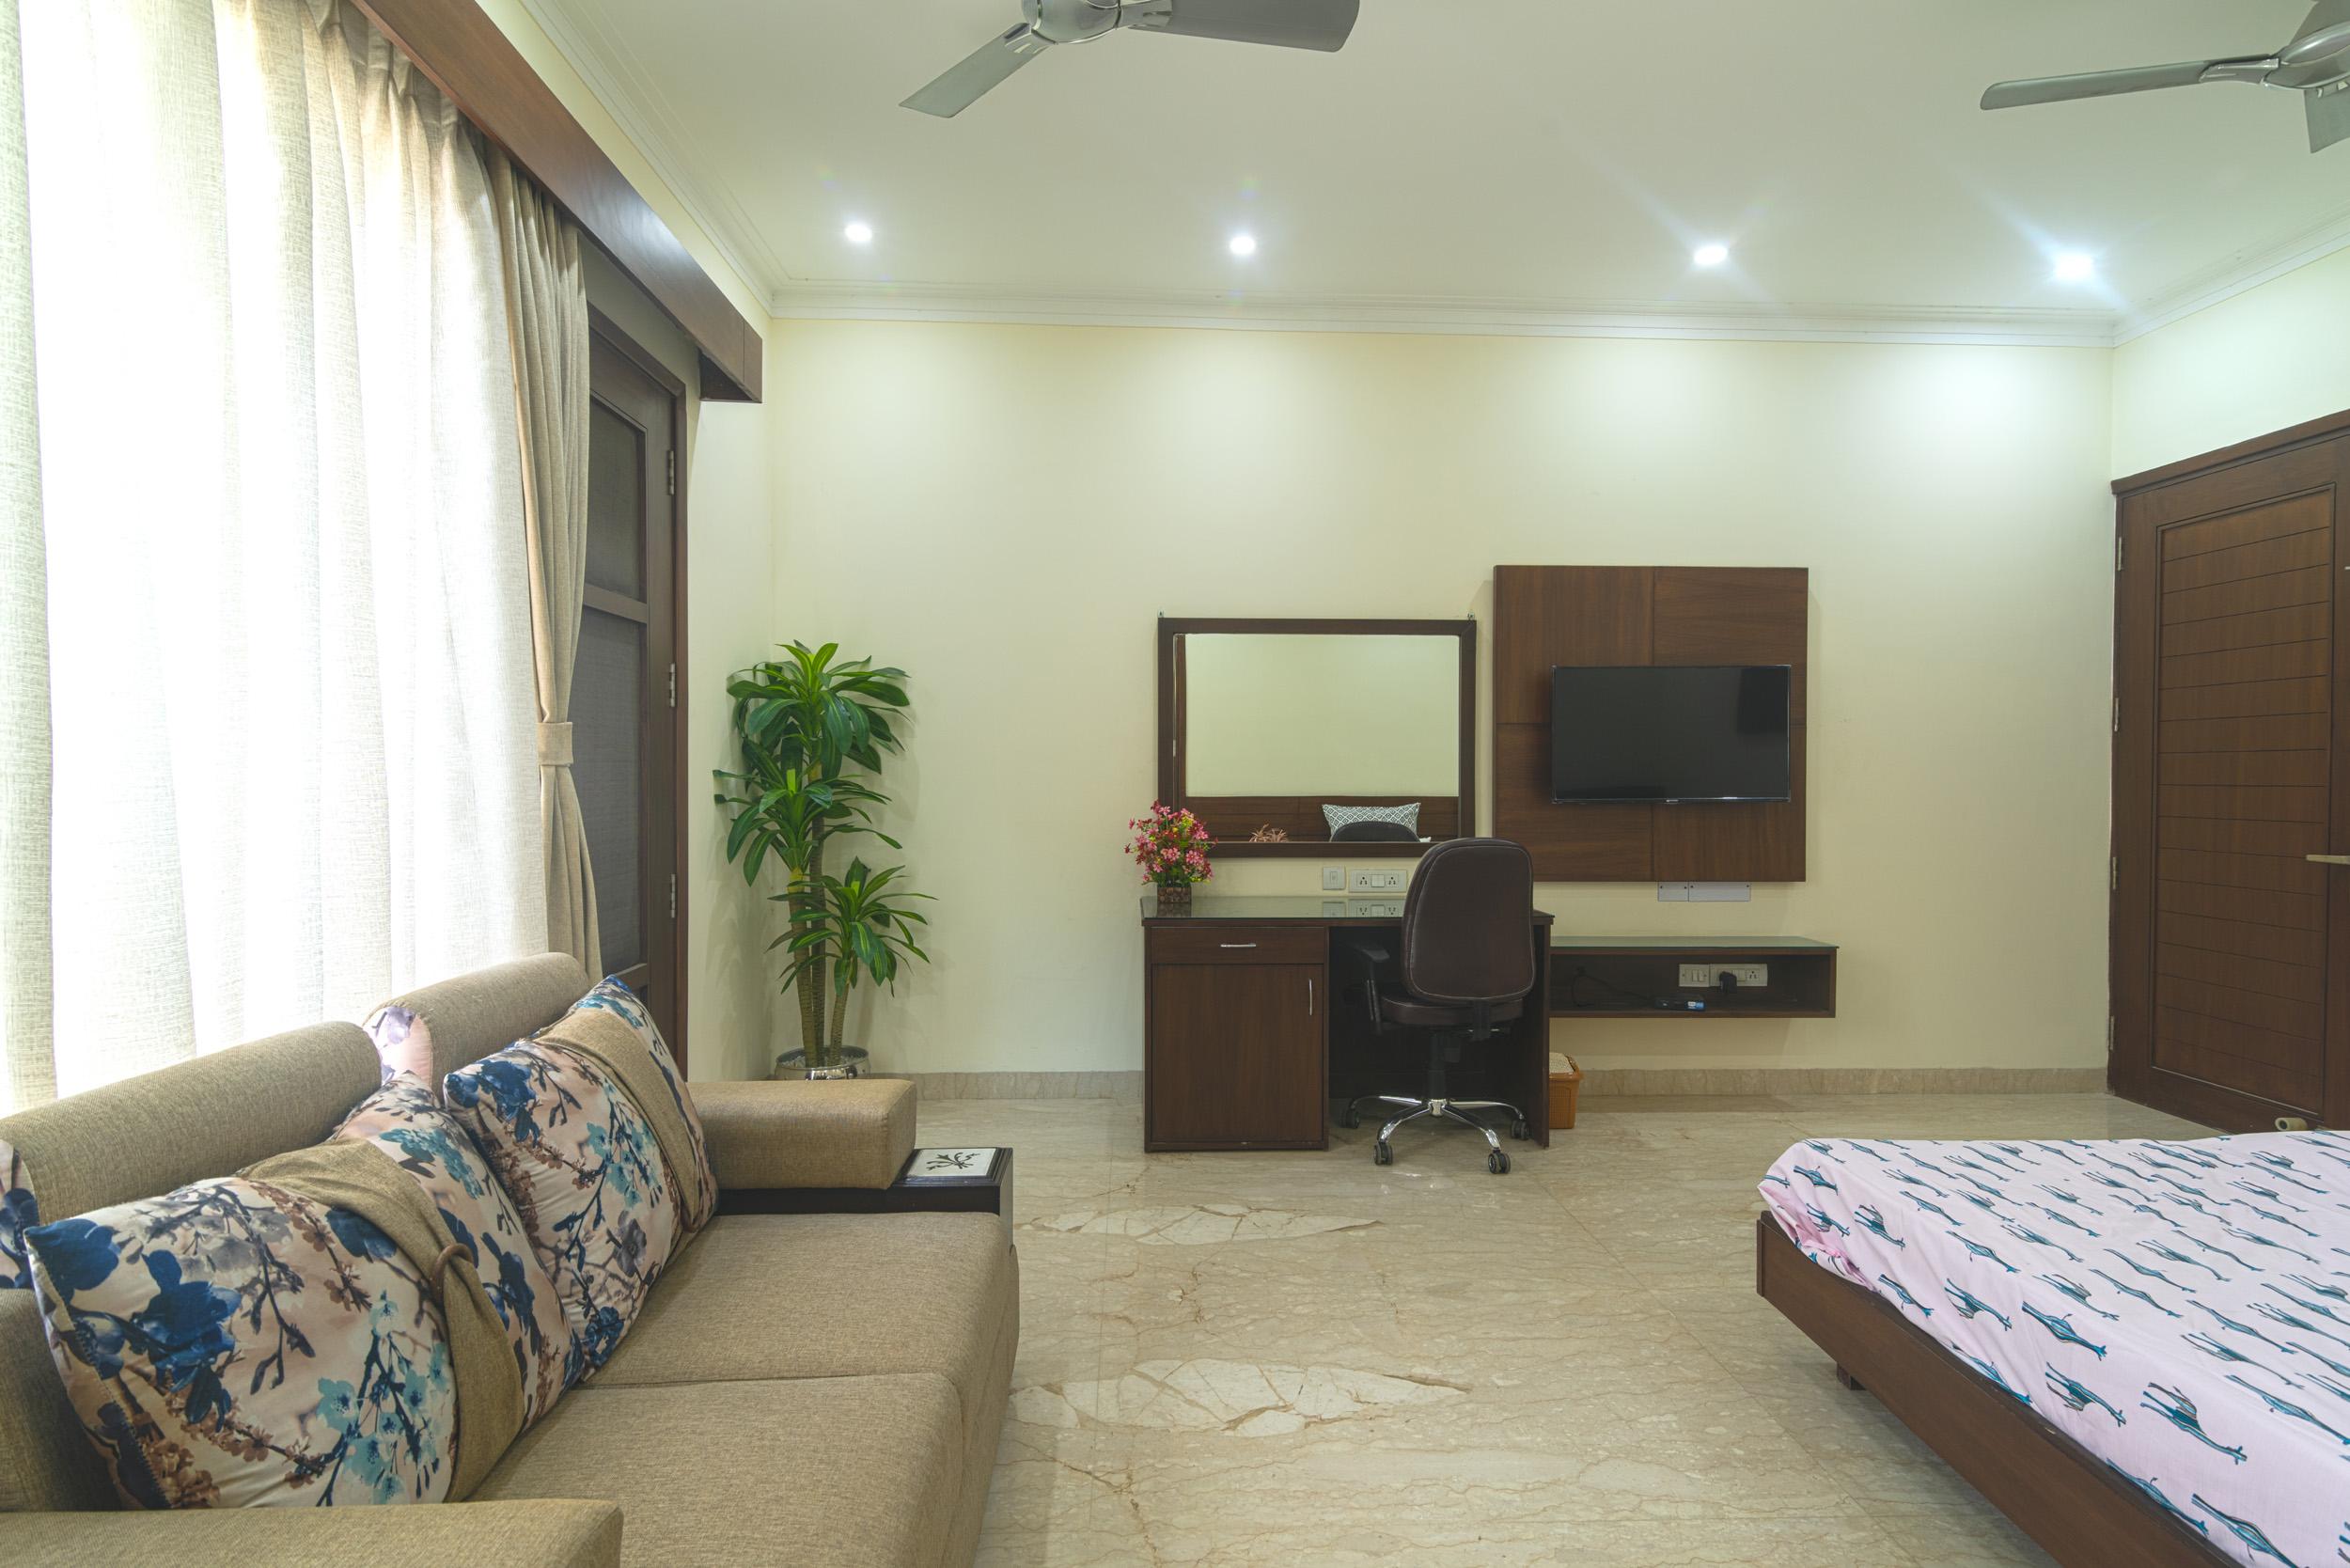 Perch Arbor- Sohna Road,Studio Apartment, Room side View